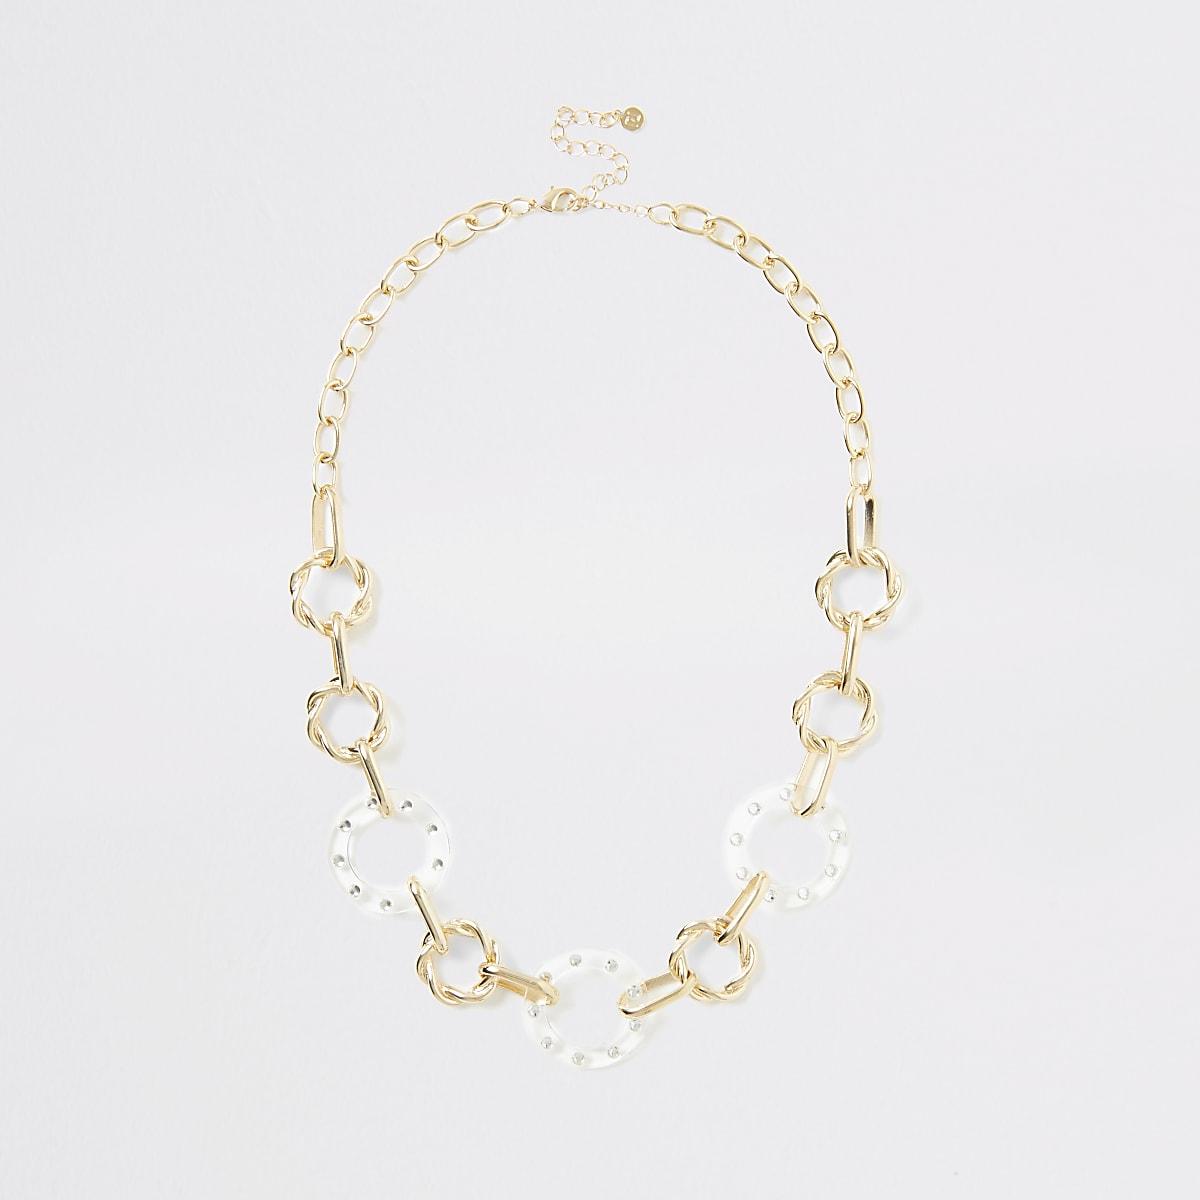 Goudkleurige diamanté ketting met cirkel